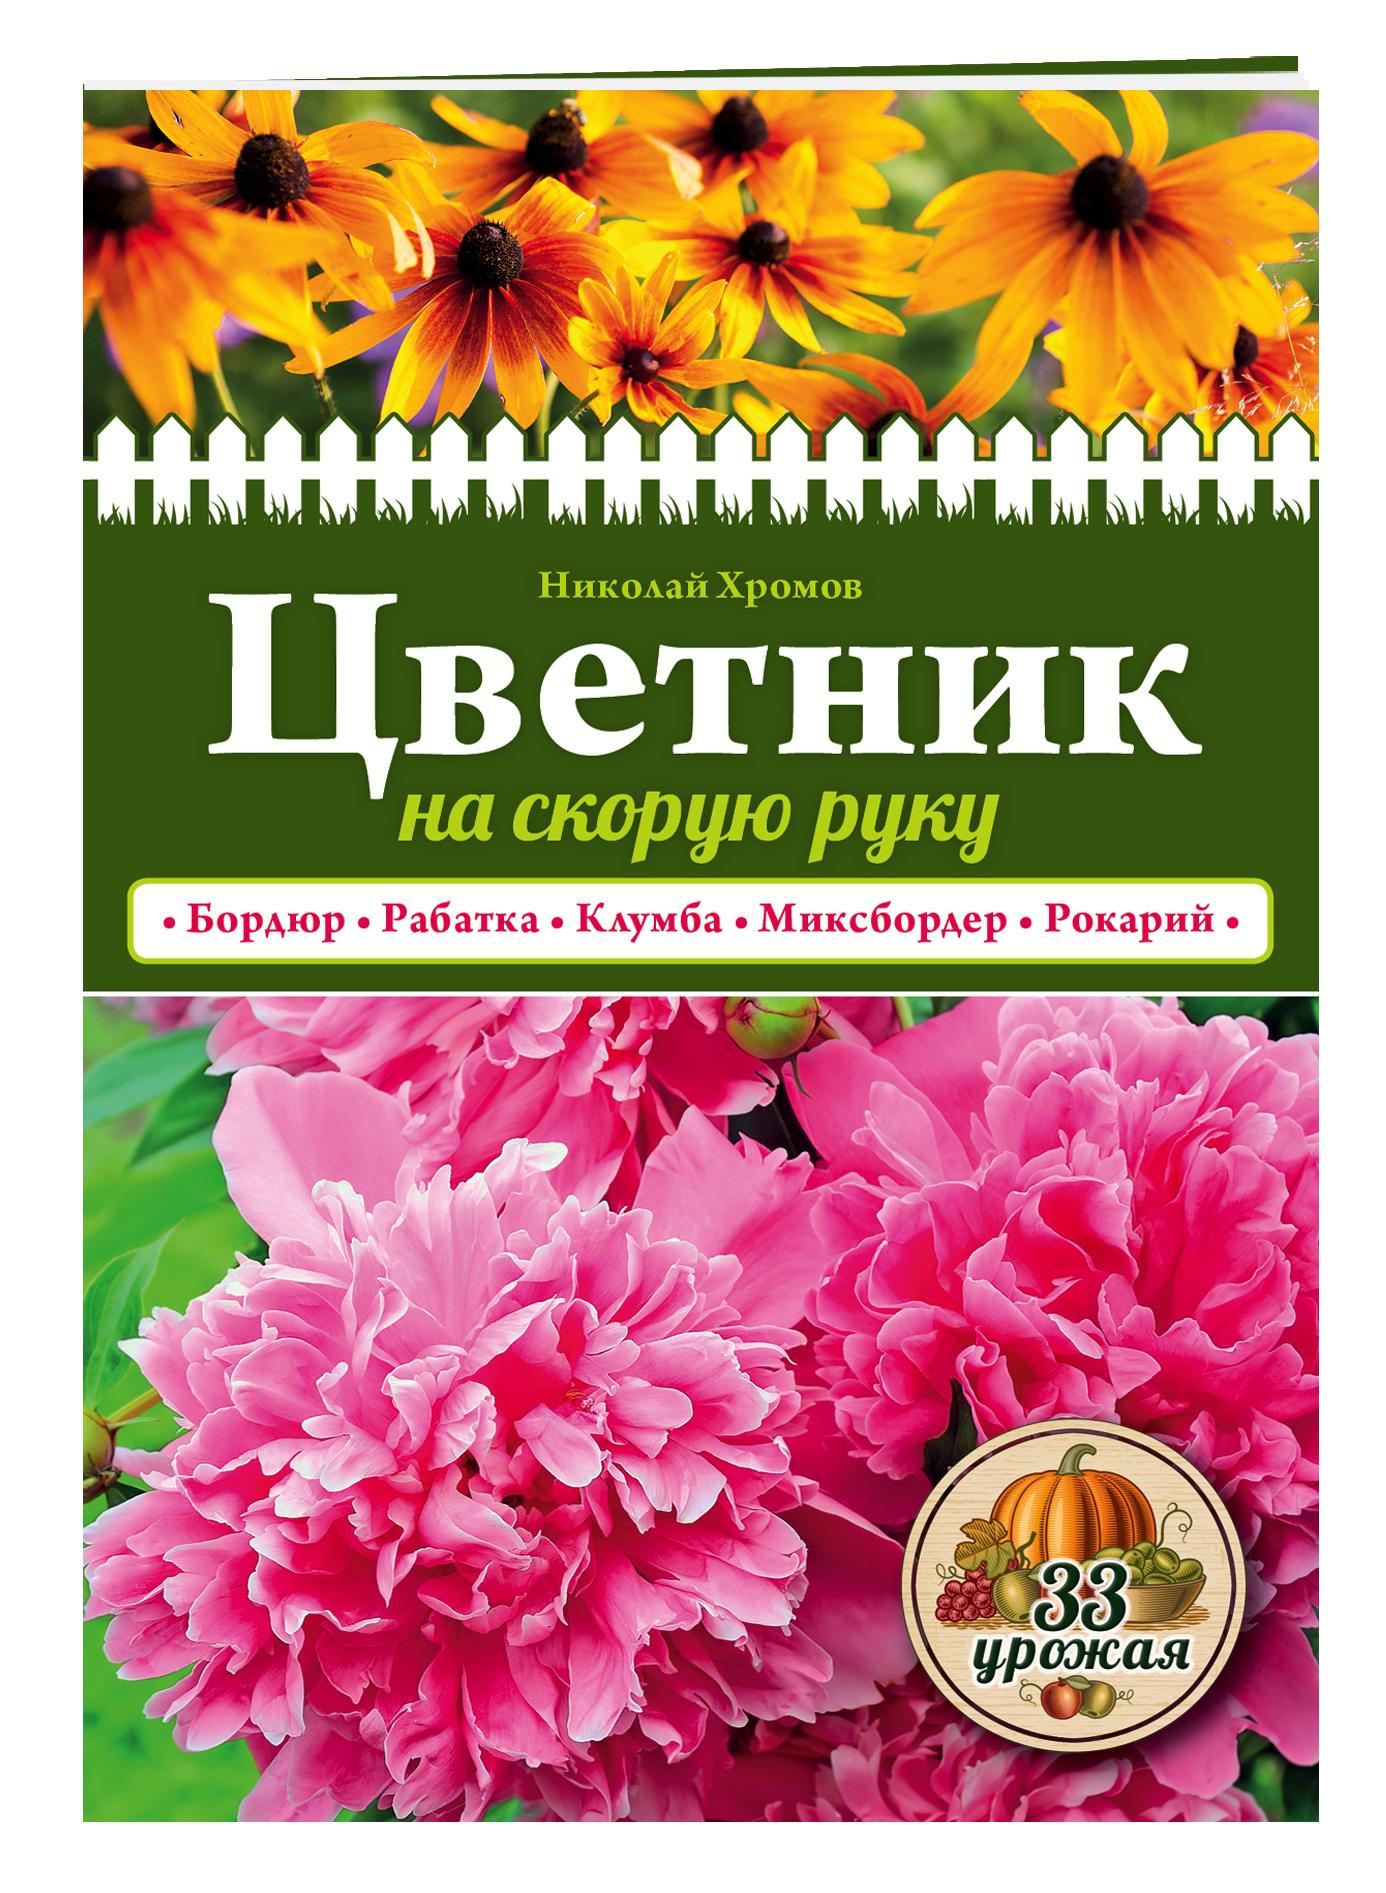 Цветник на скорую руку от book24.ru